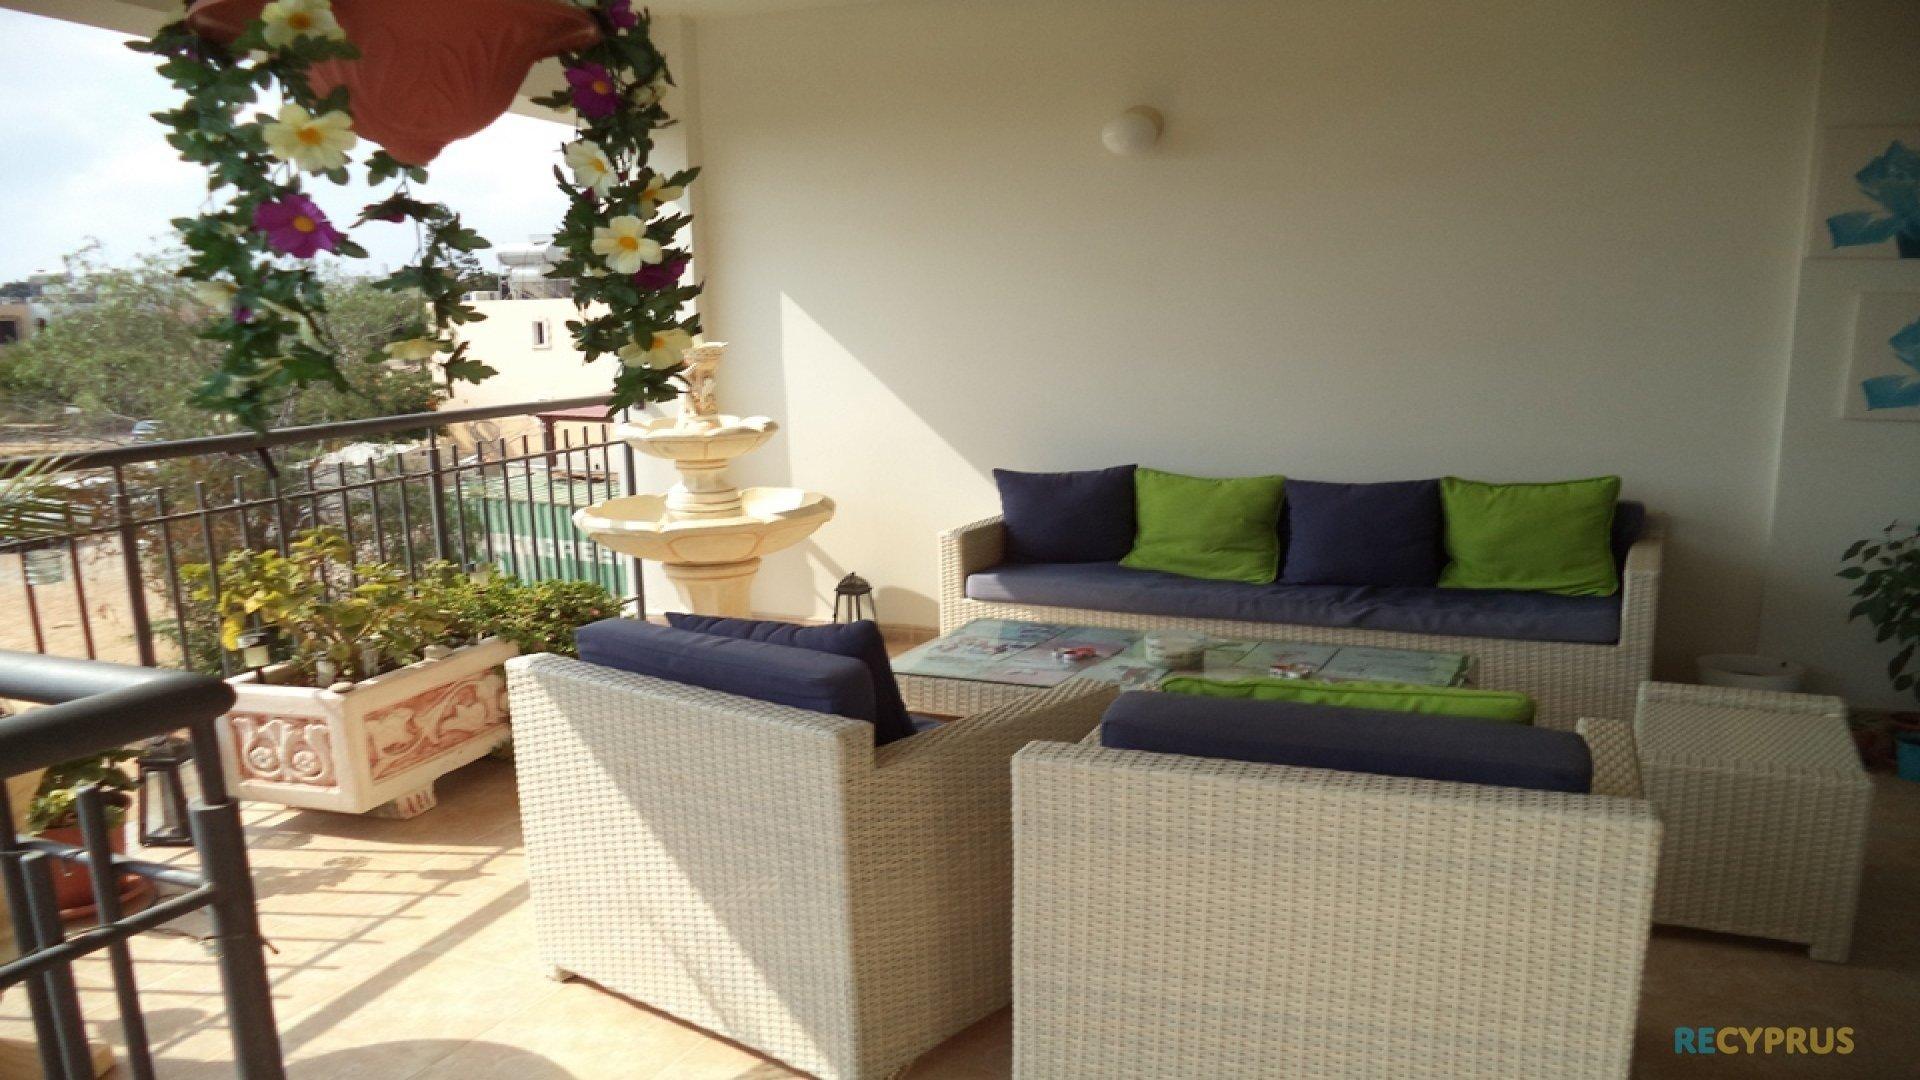 Apartment for sale Kapparis Famagusta Cyprus 13 3463